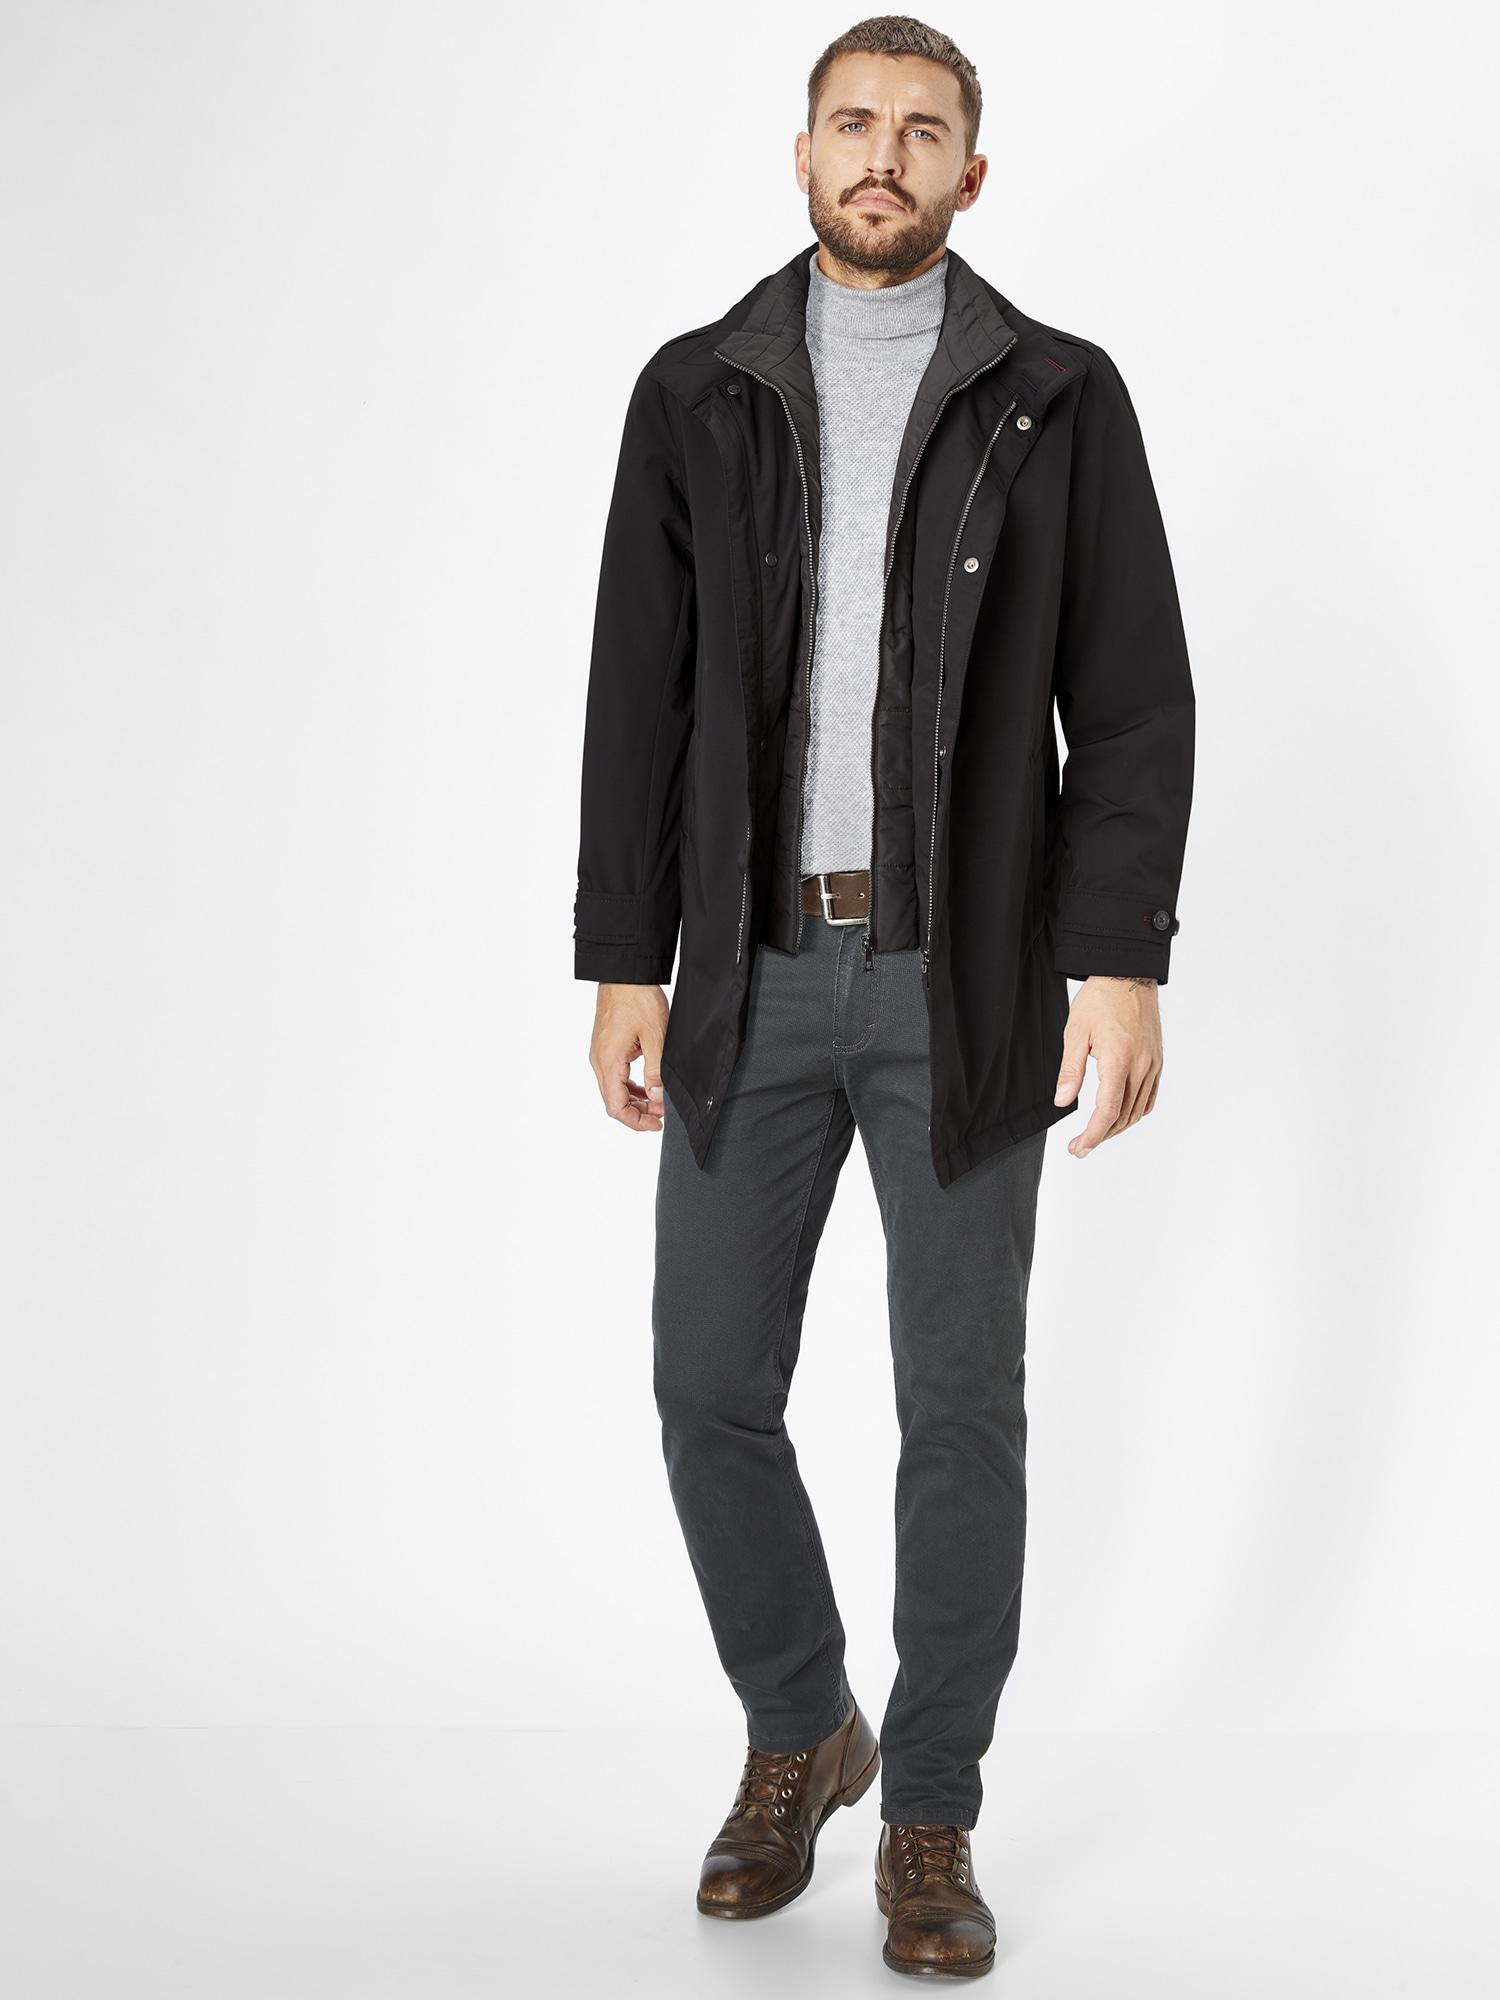 s4 jackets -  Outdoorjacke Toronto, klassische Winterjacke